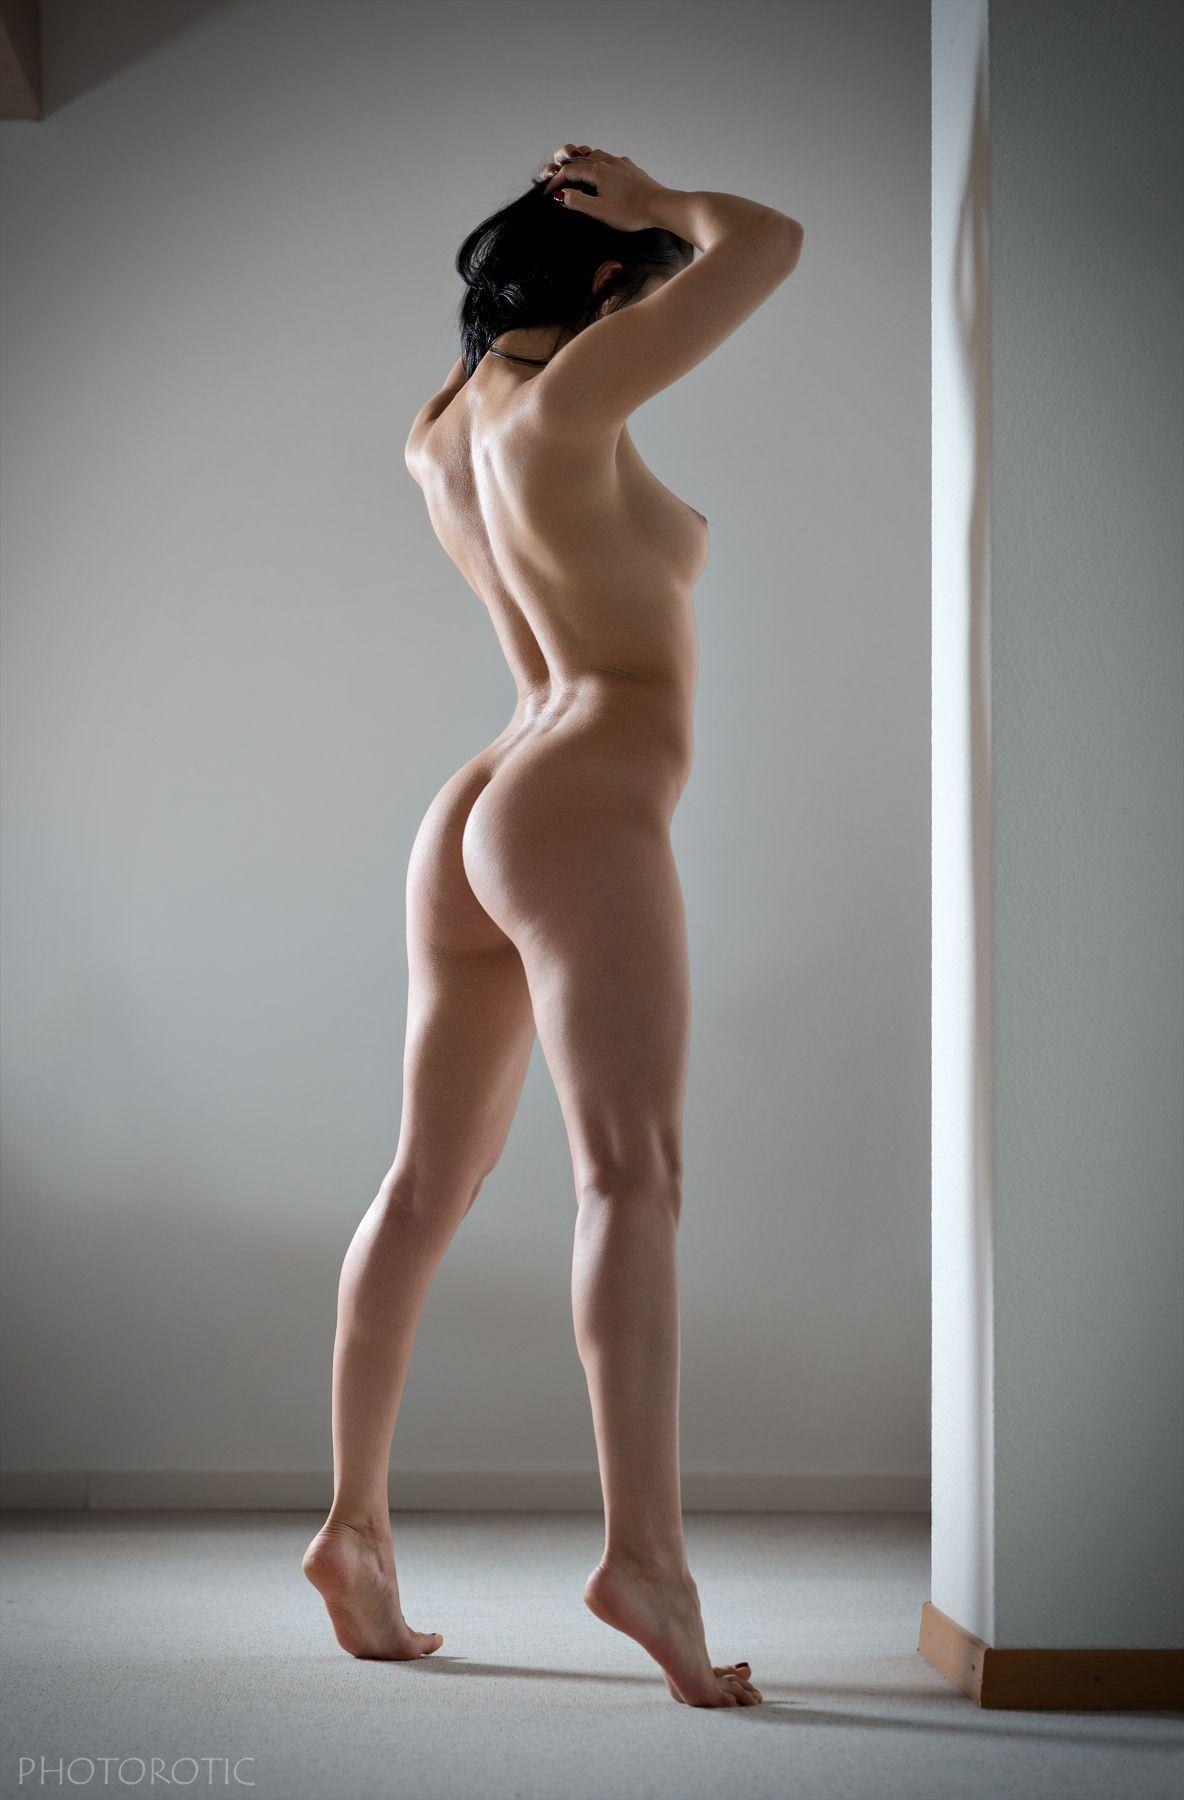 Simple nude artistic nude photo by photographer francois benveniste